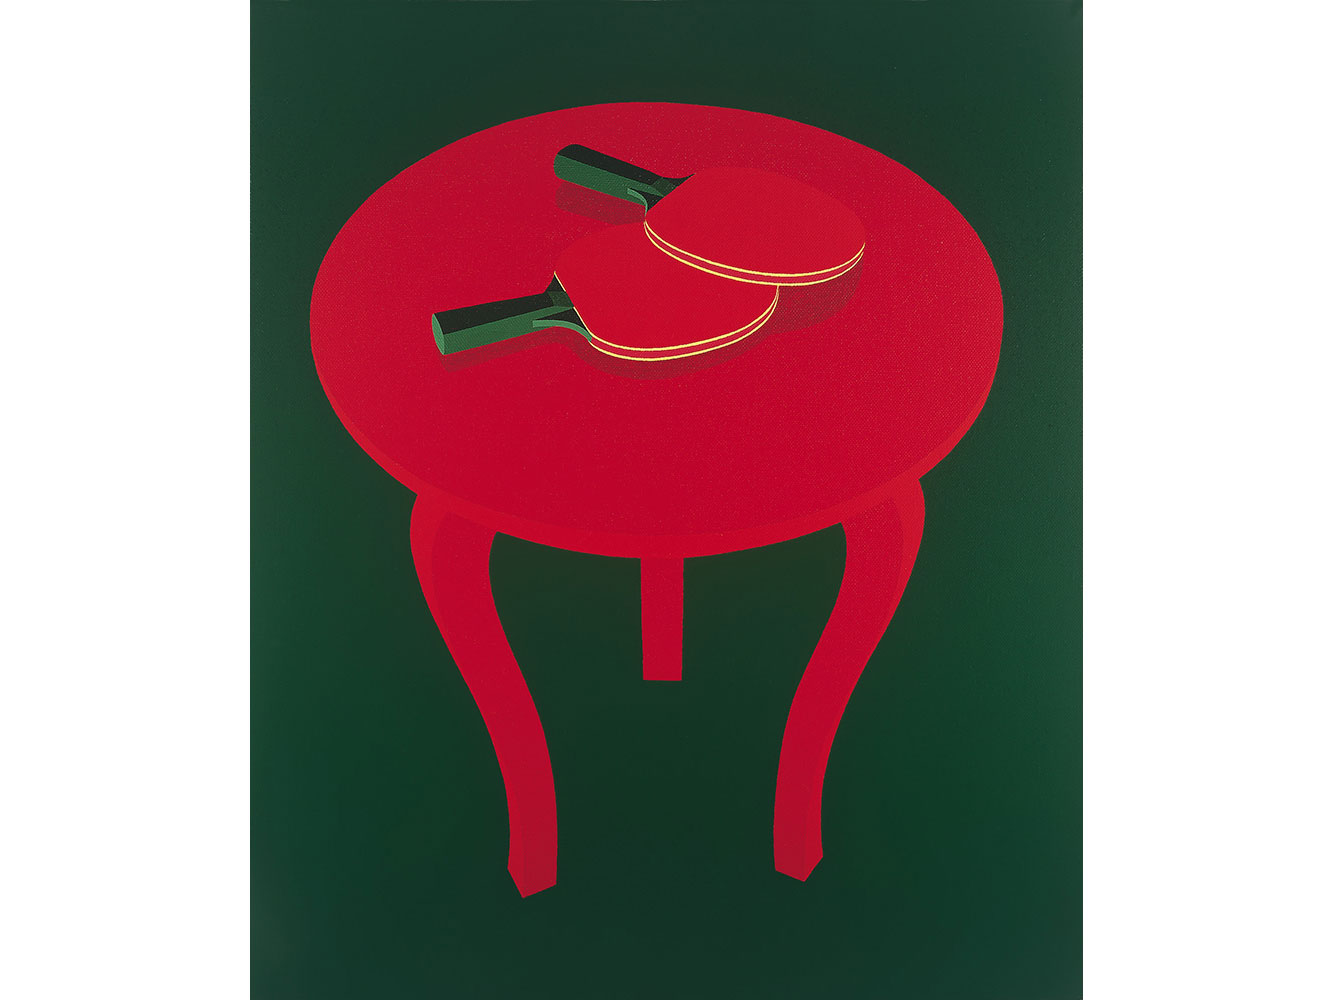 Prototipo 3, 1994. Acrylic / canvas. 55 x 45 cm